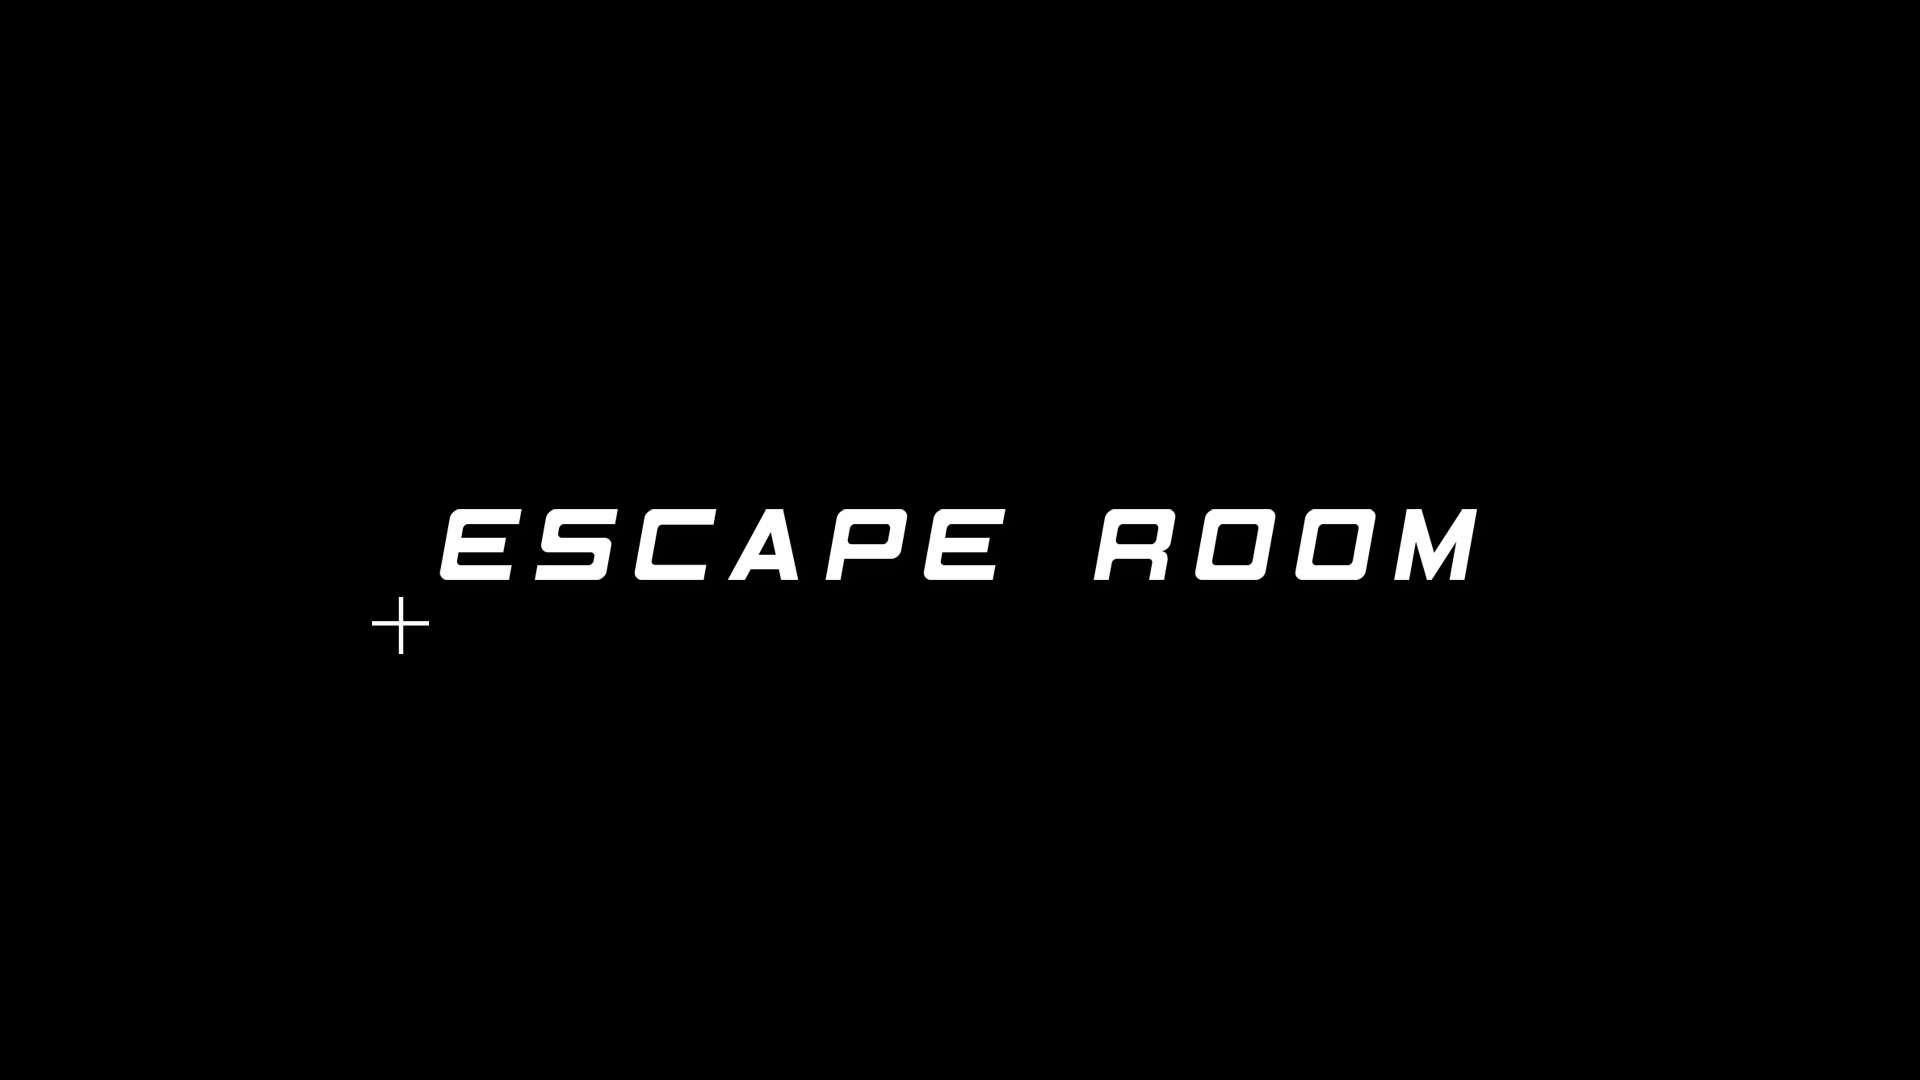 Escape Room Katy Freeway